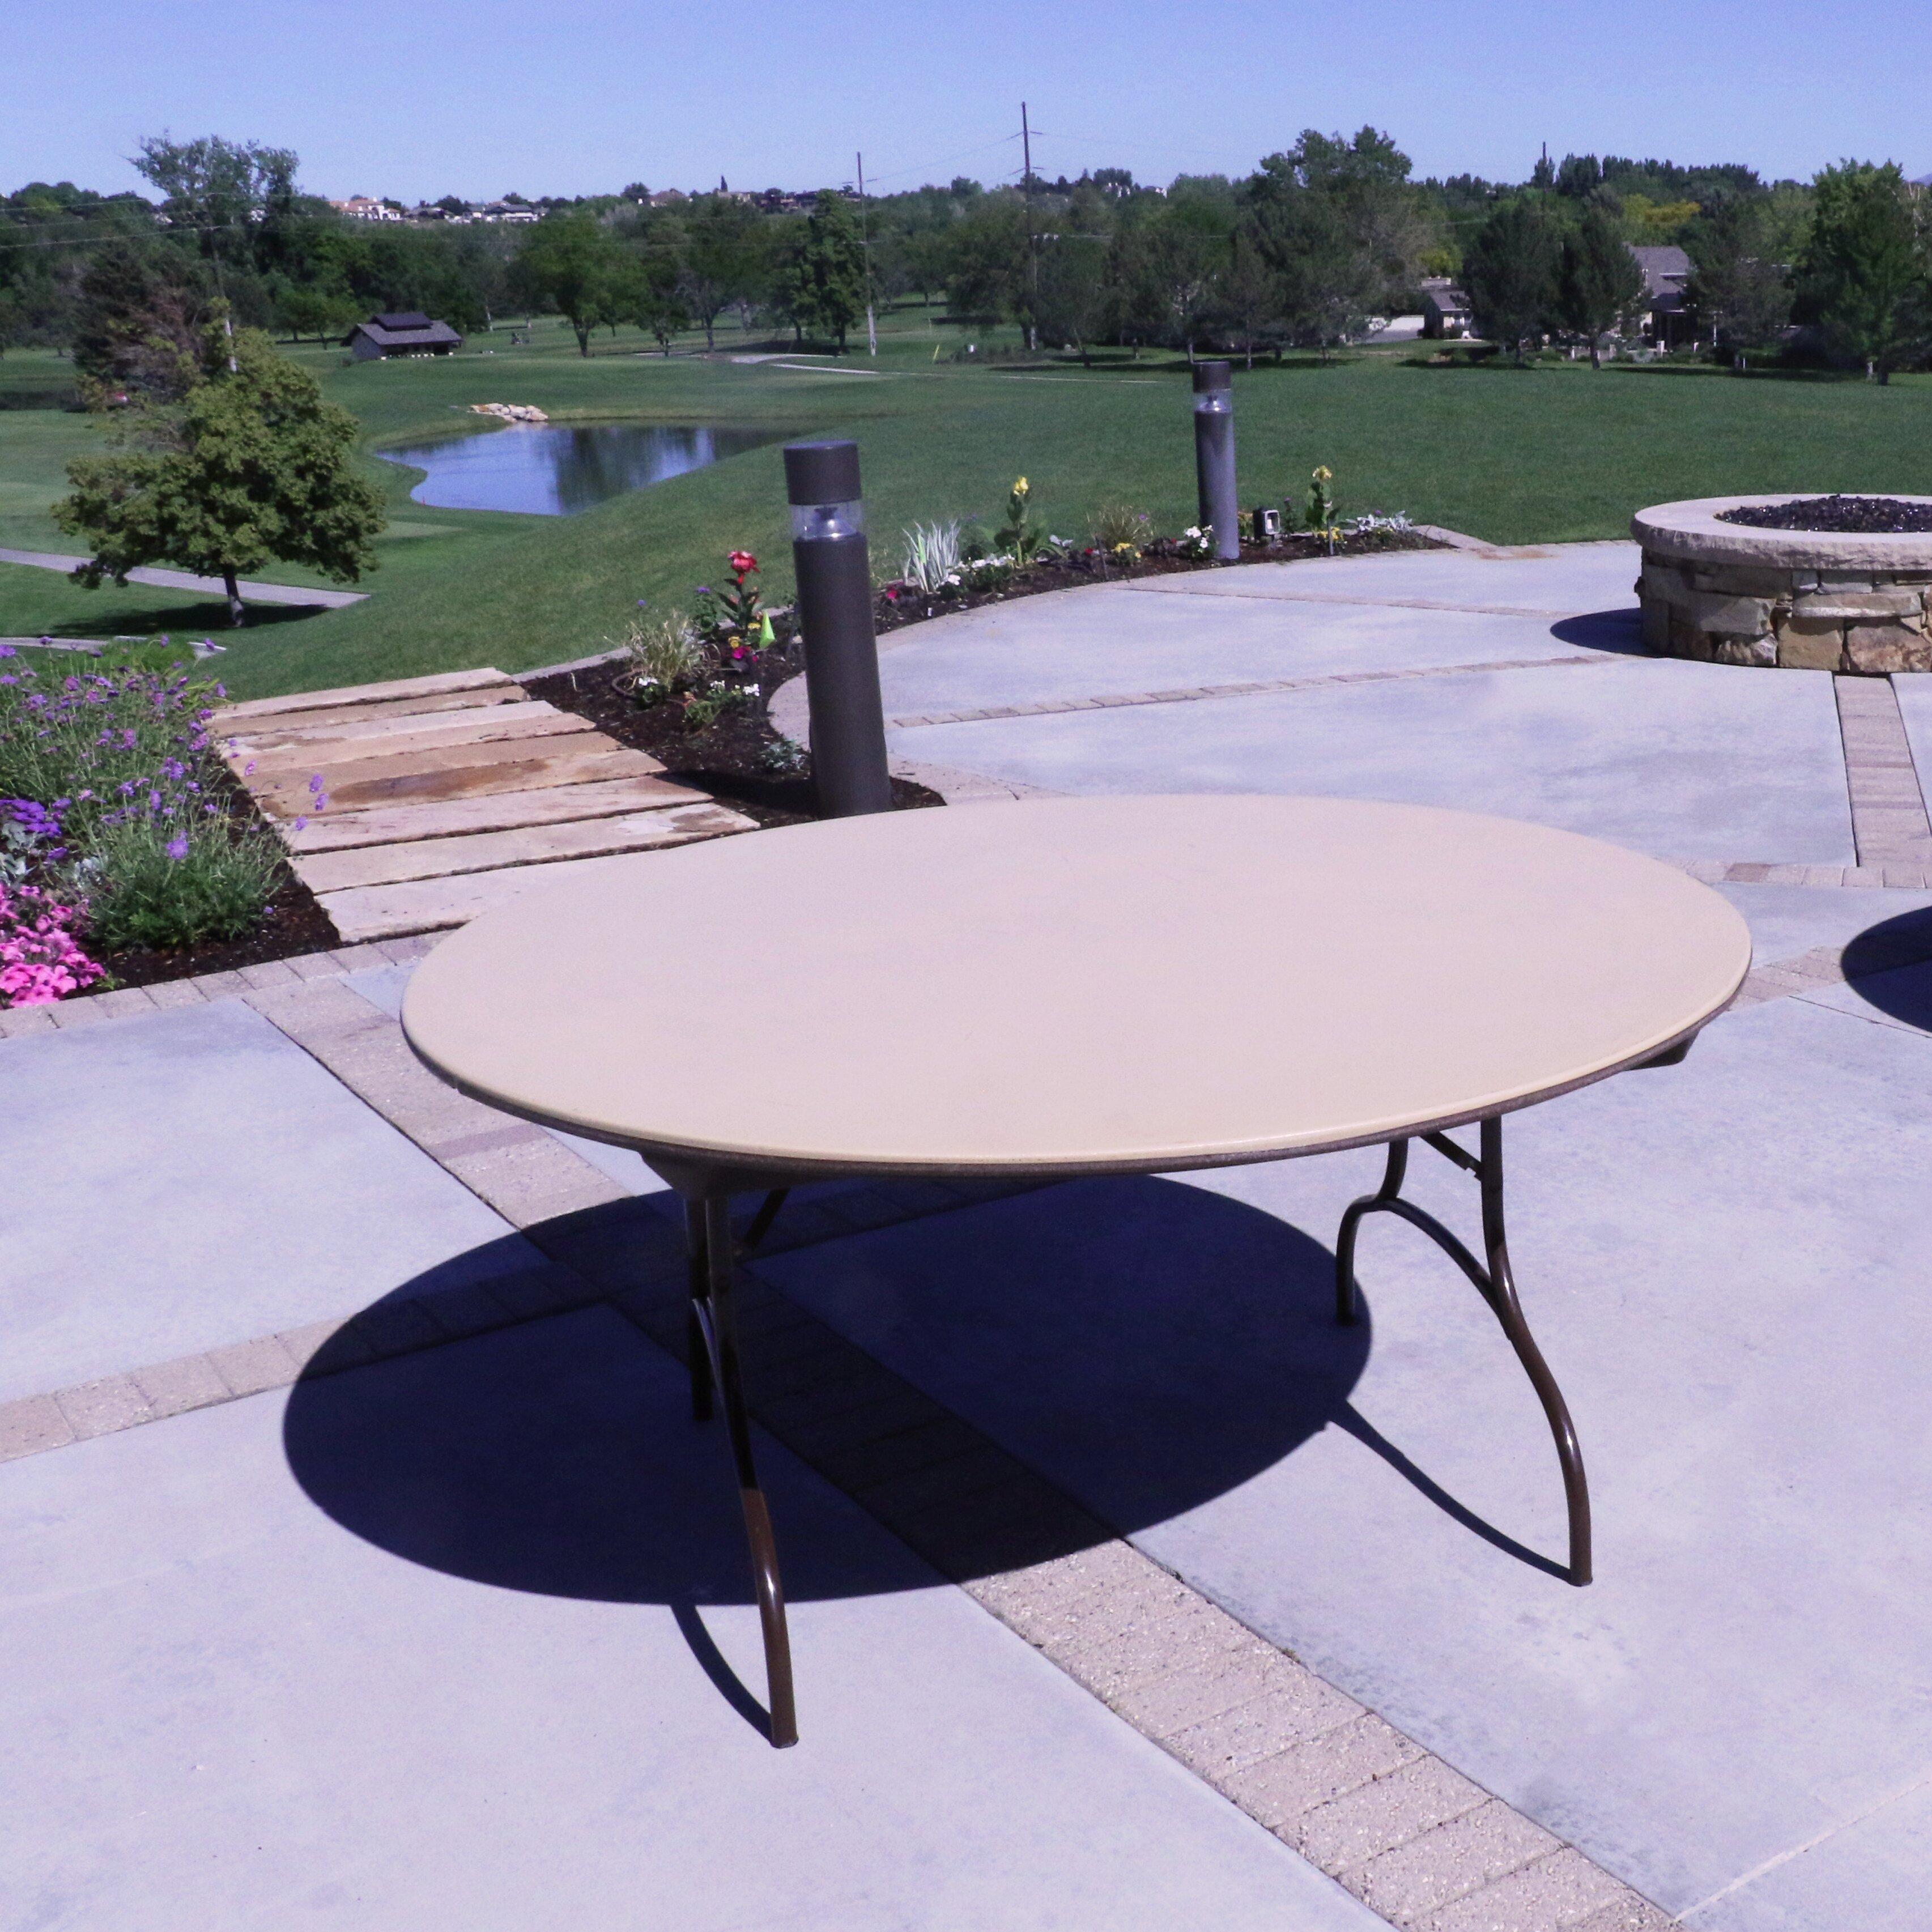 Tremendous 60 Circular Folding Table Interior Design Ideas Gentotryabchikinfo